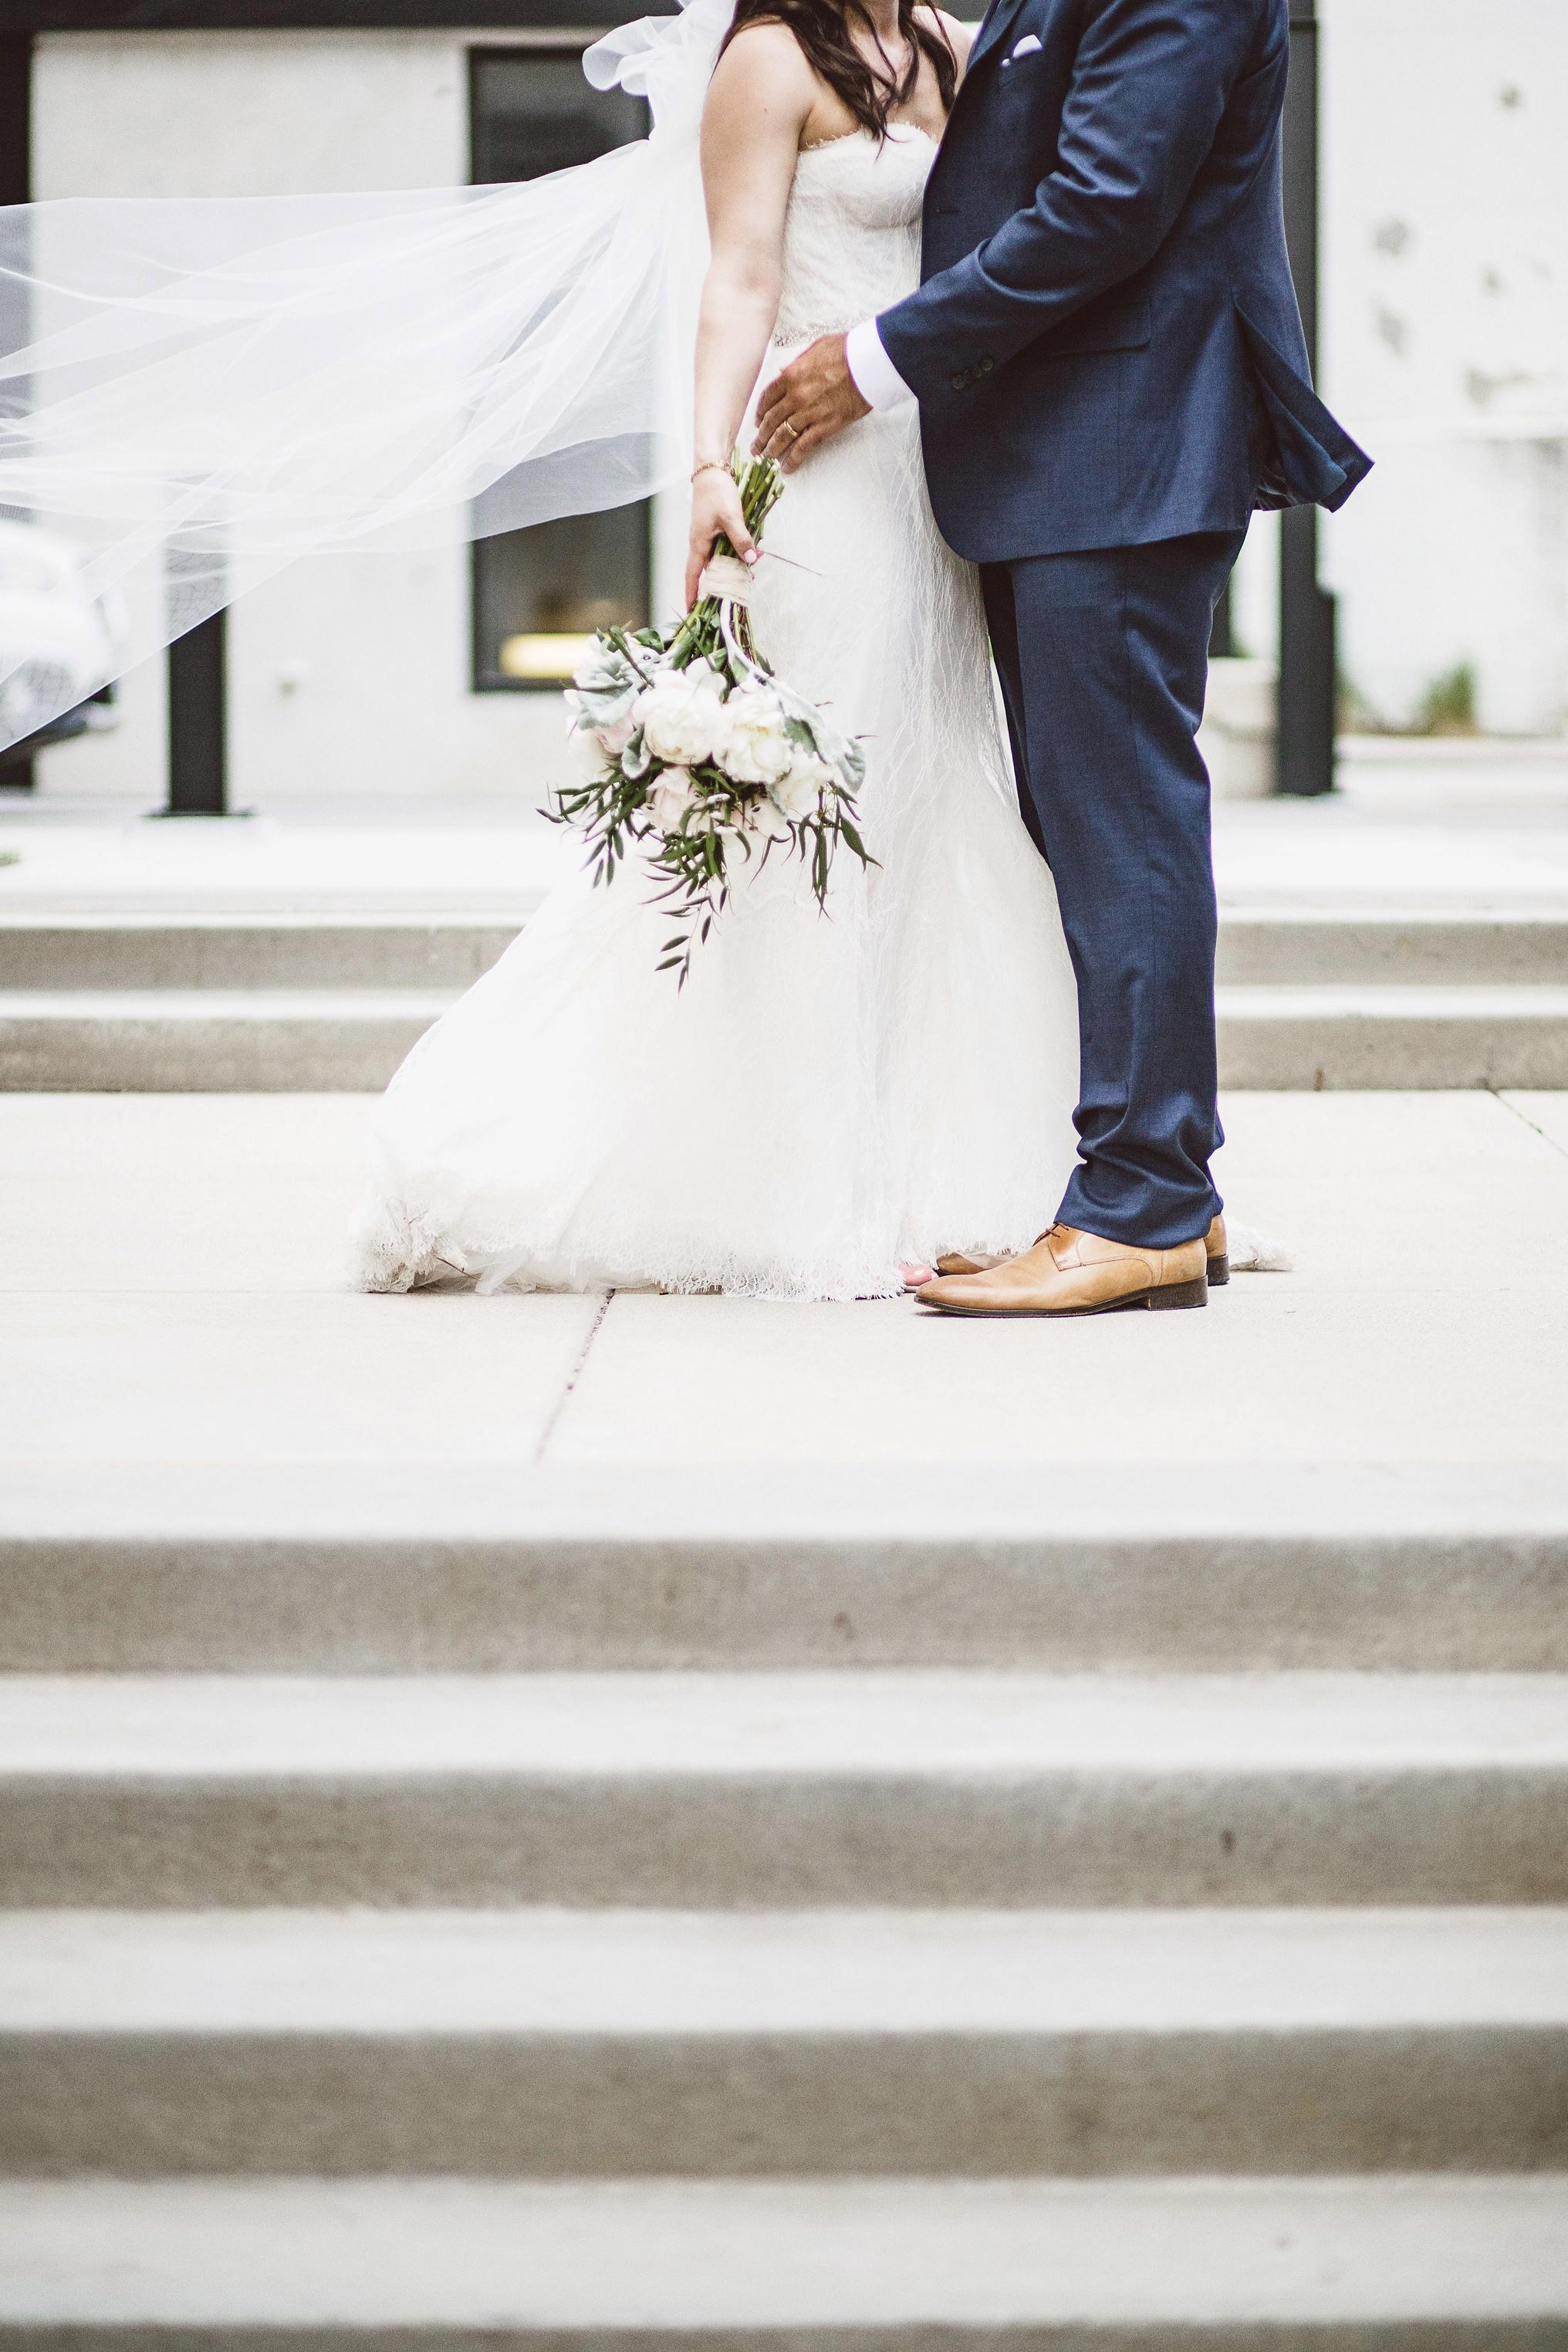 best_wedding_photography_2017_by_lucas_botz_photography_147.jpg